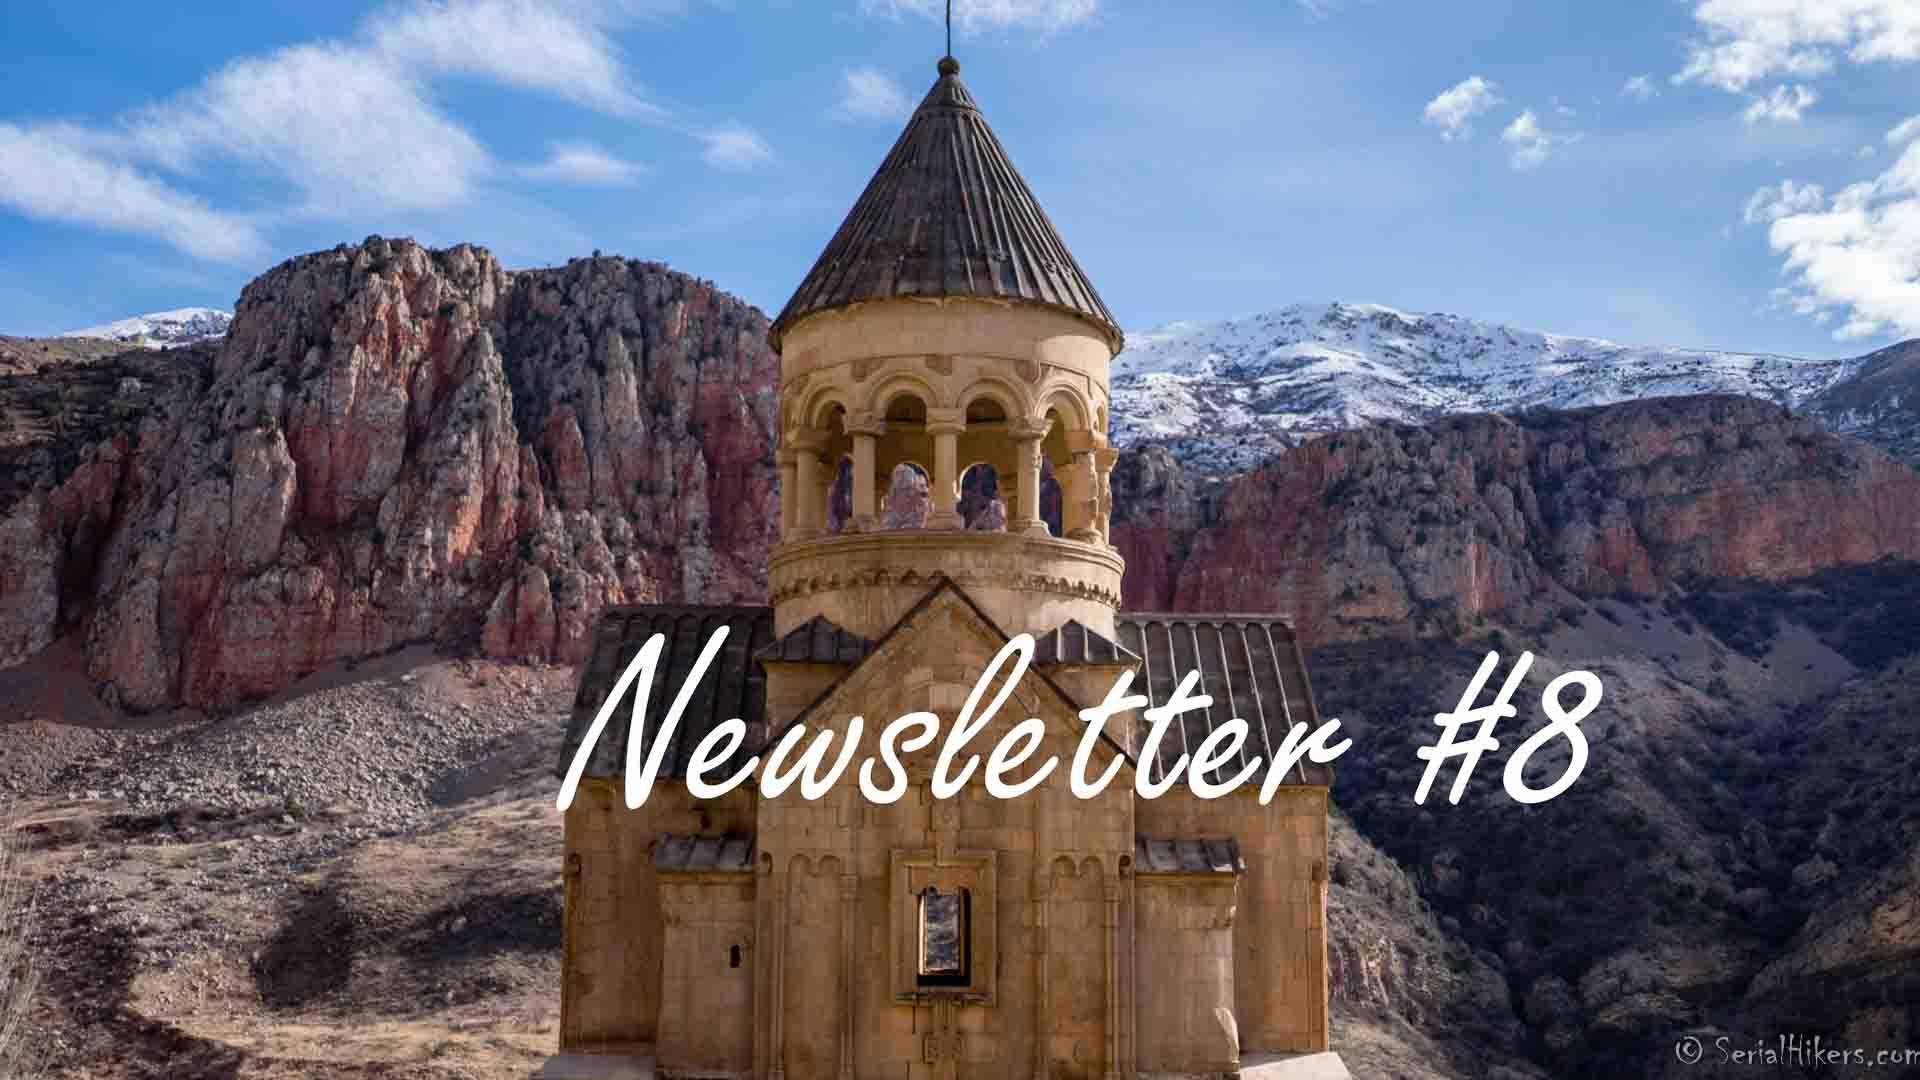 SerialHikers stop autostop world monde tour hitchhiking aventure adventure alternative travel voyage sans avion no fly caucase armenia armenie Noravank monastery monastère